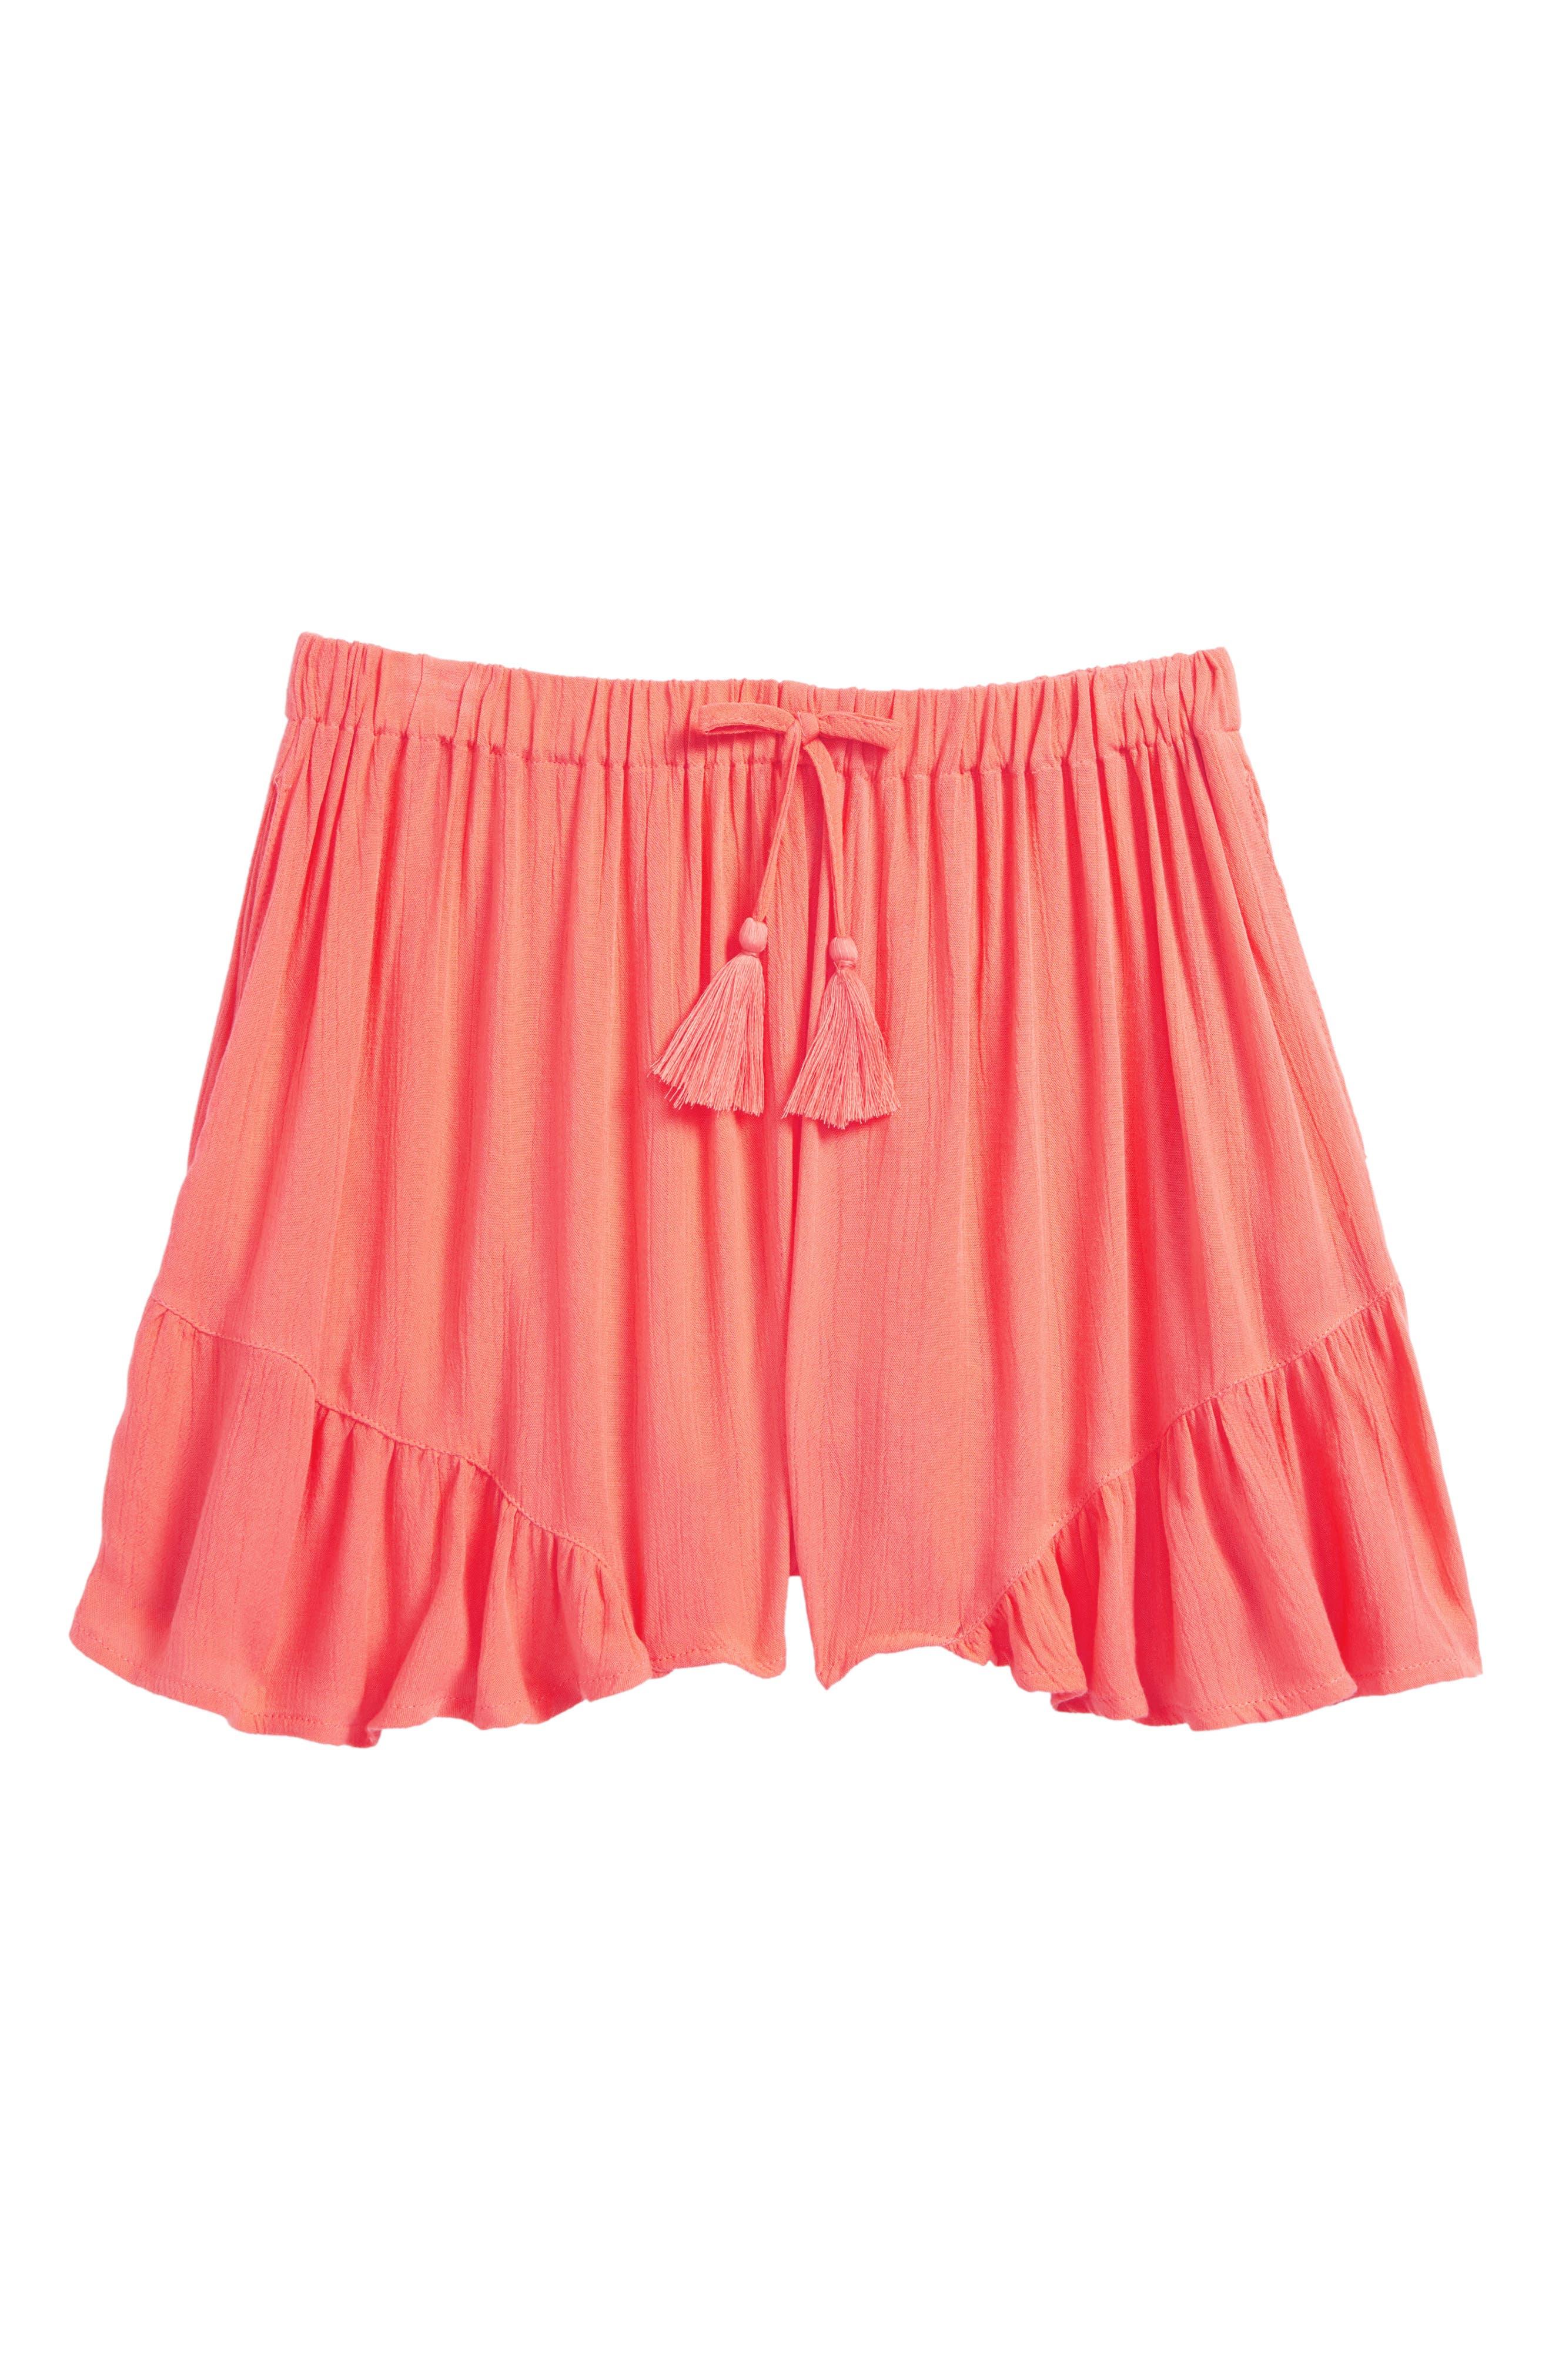 Ruffle Hem Shorts,                             Main thumbnail 1, color,                             950